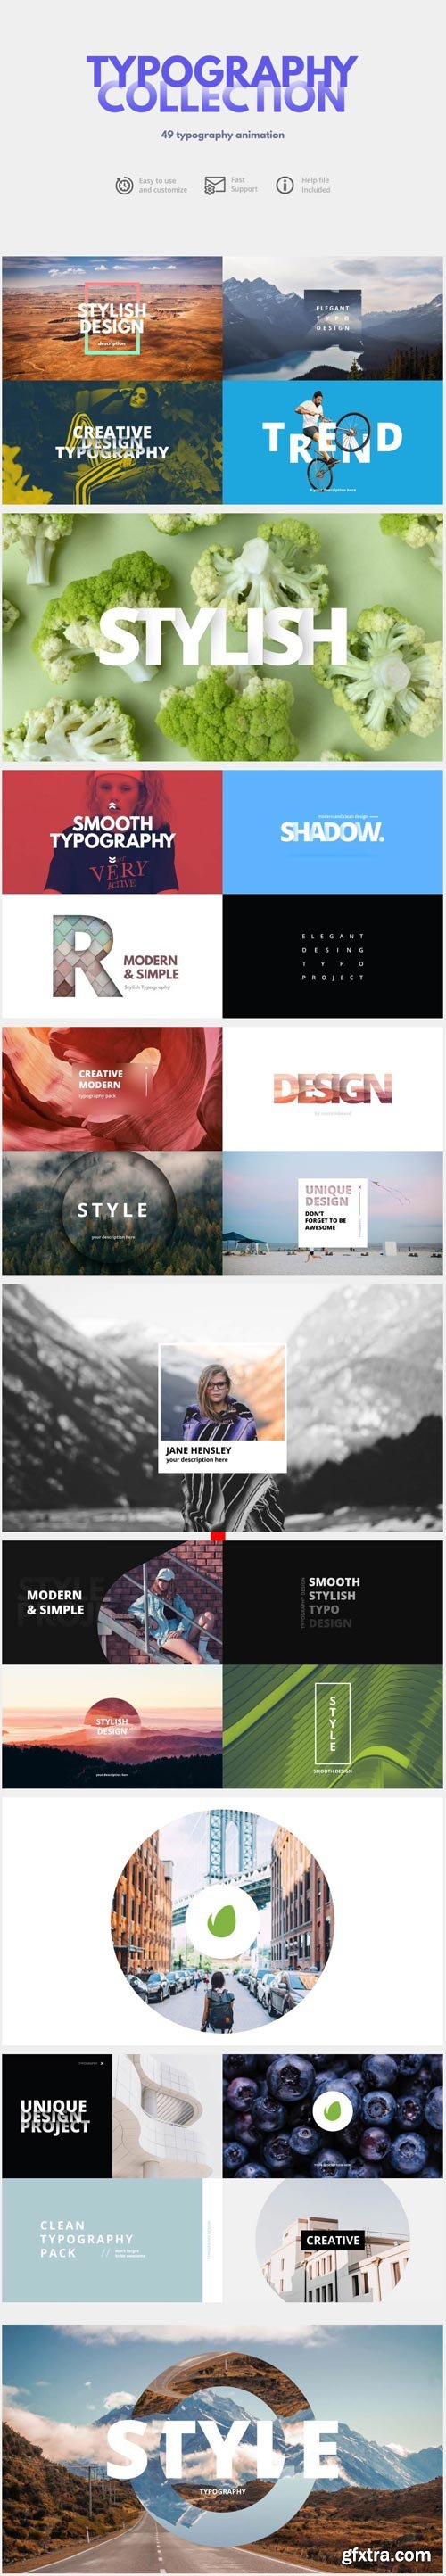 Videohive - Typography - 21571786